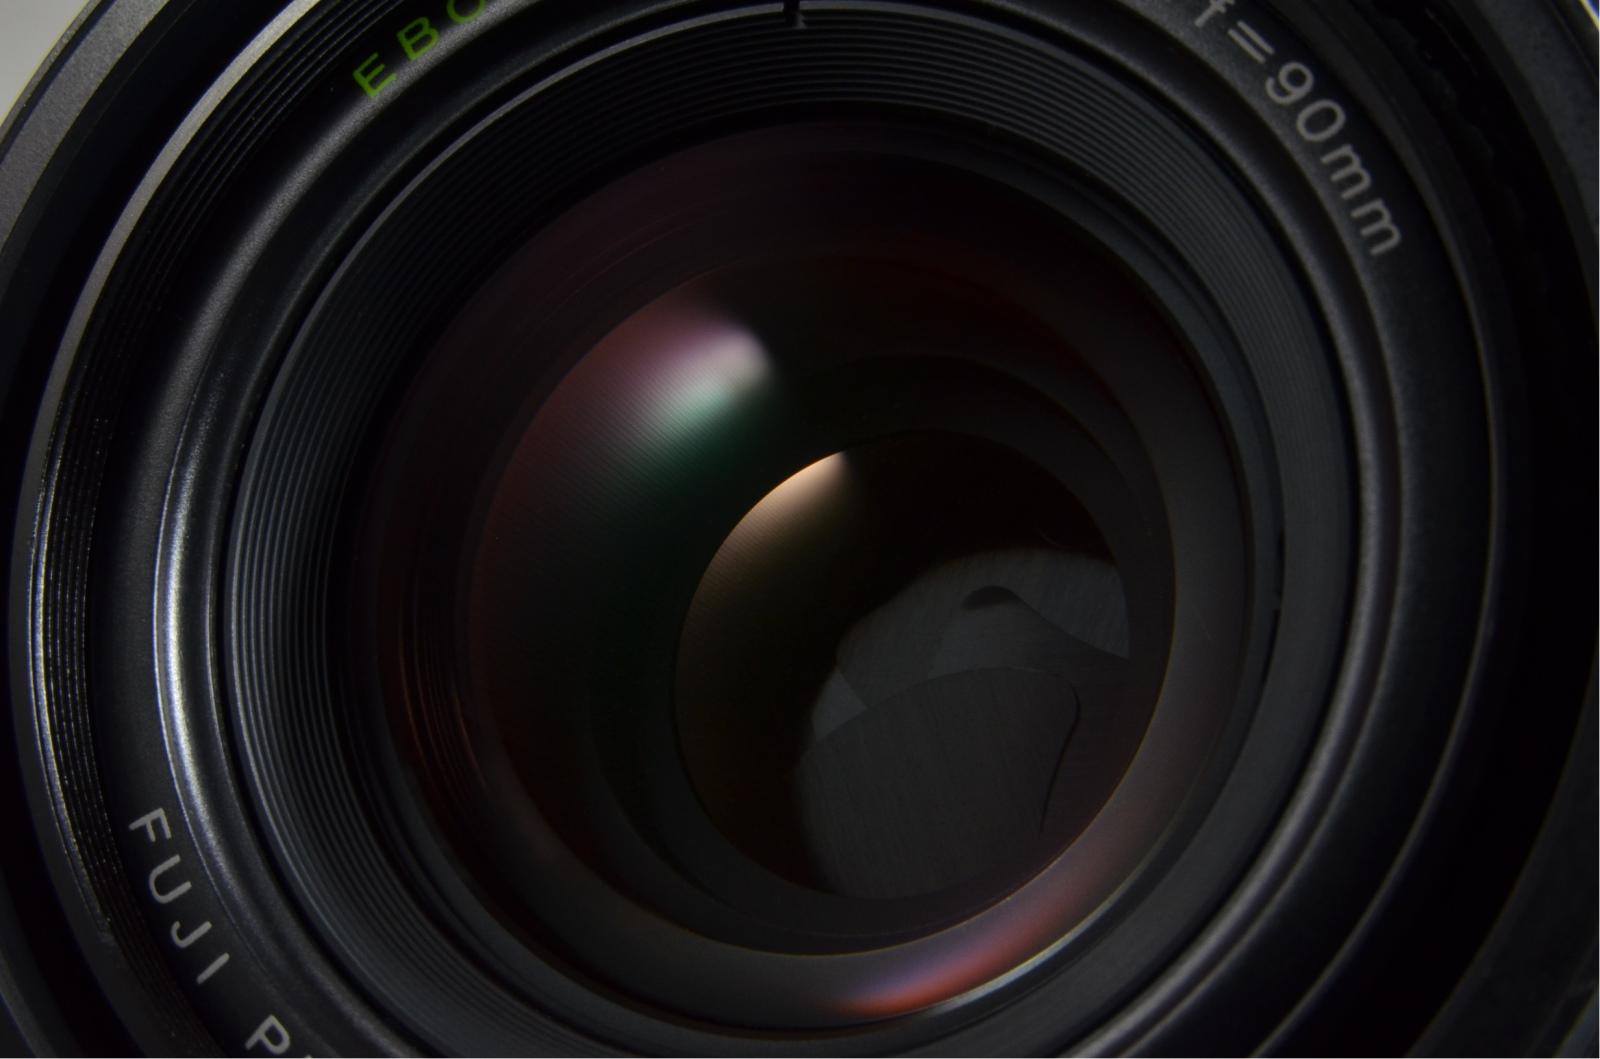 fuji fujifilm gw690iii 90mm f3.5 medium format count '170'